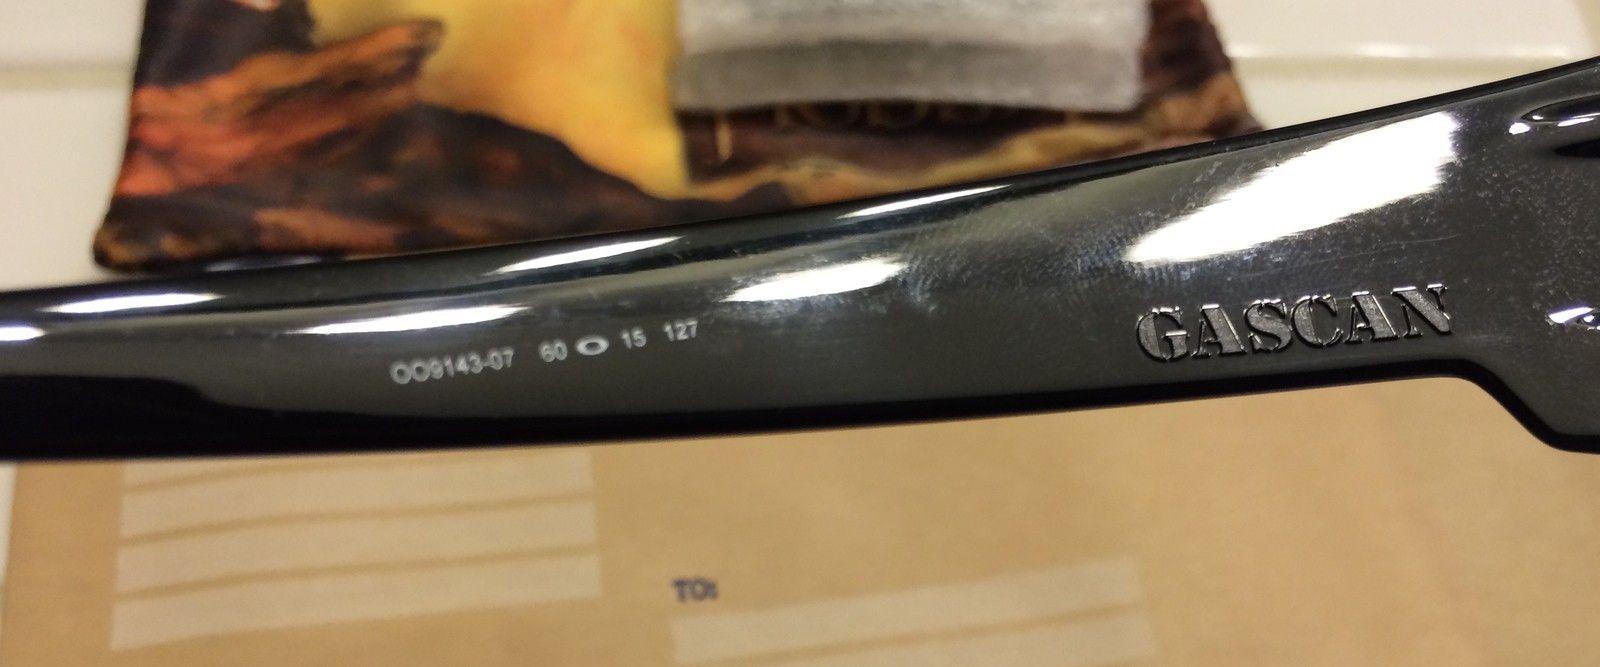 Oakley Gascan - Hobbit 3D - Xtra Lenses -under $99 - 2015-07-01 18.37.41.jpg